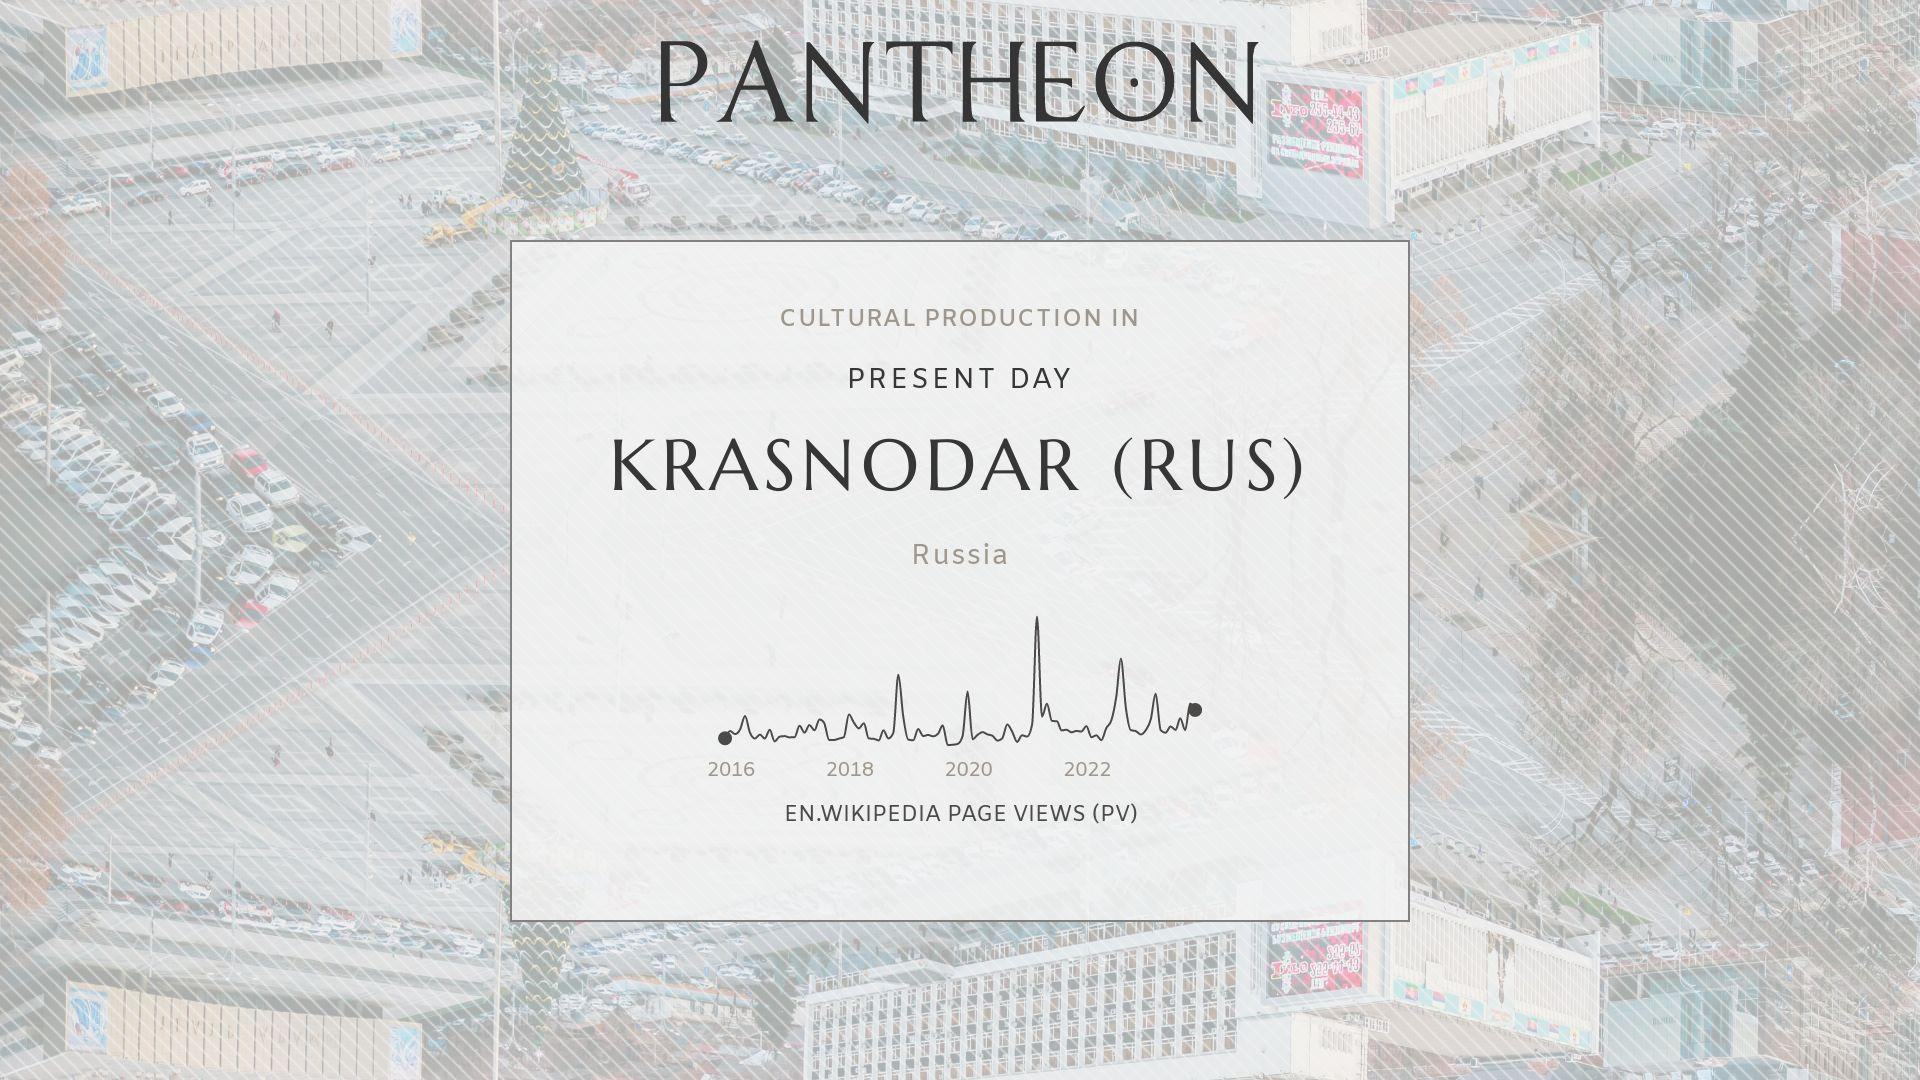 Krasnodar Pantheon